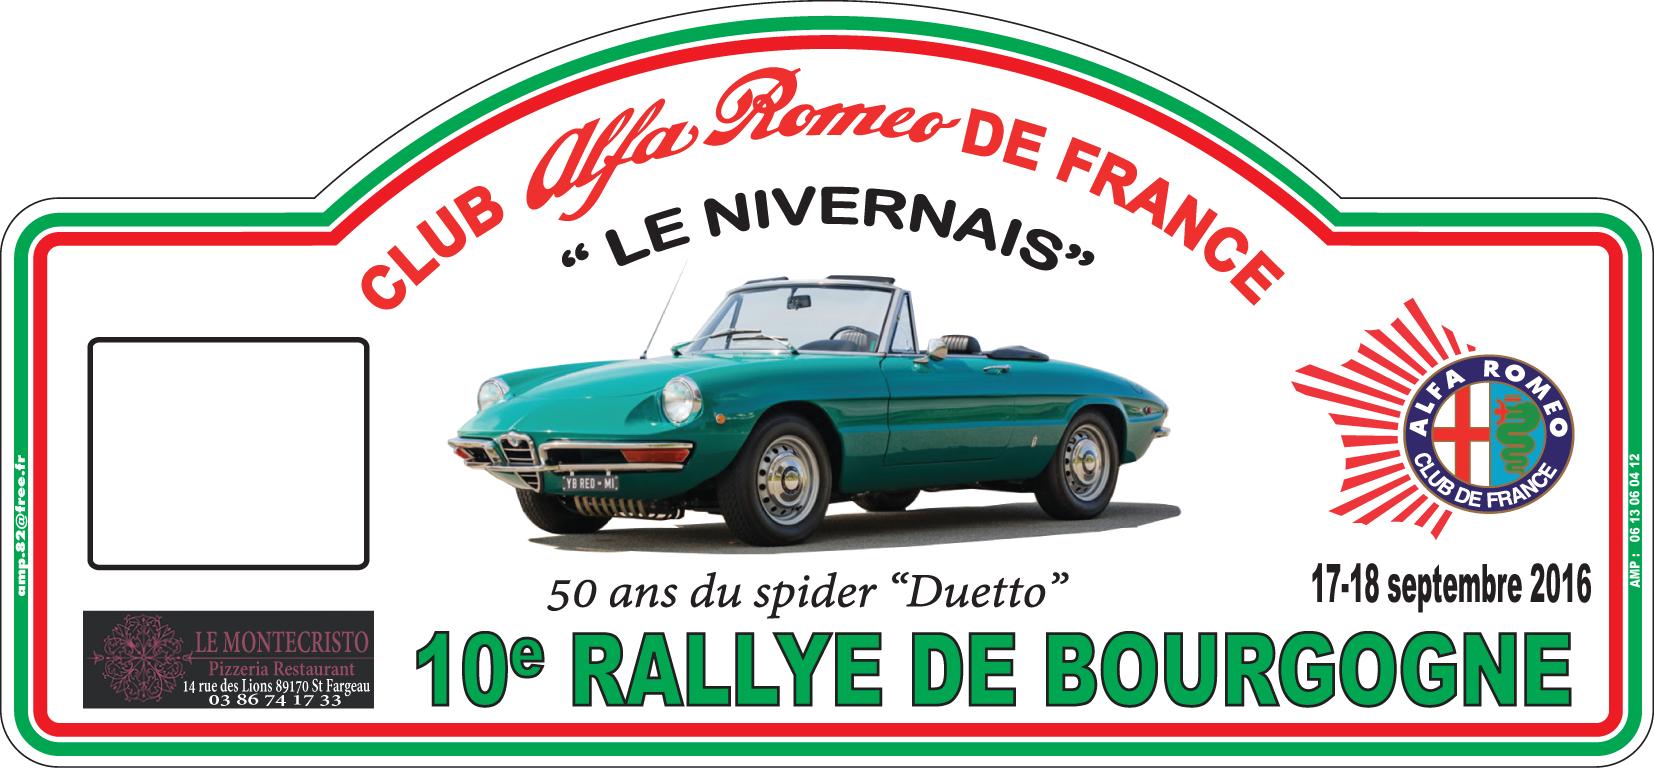 Stock anciens Forza, plaque Rallye, objets du Club